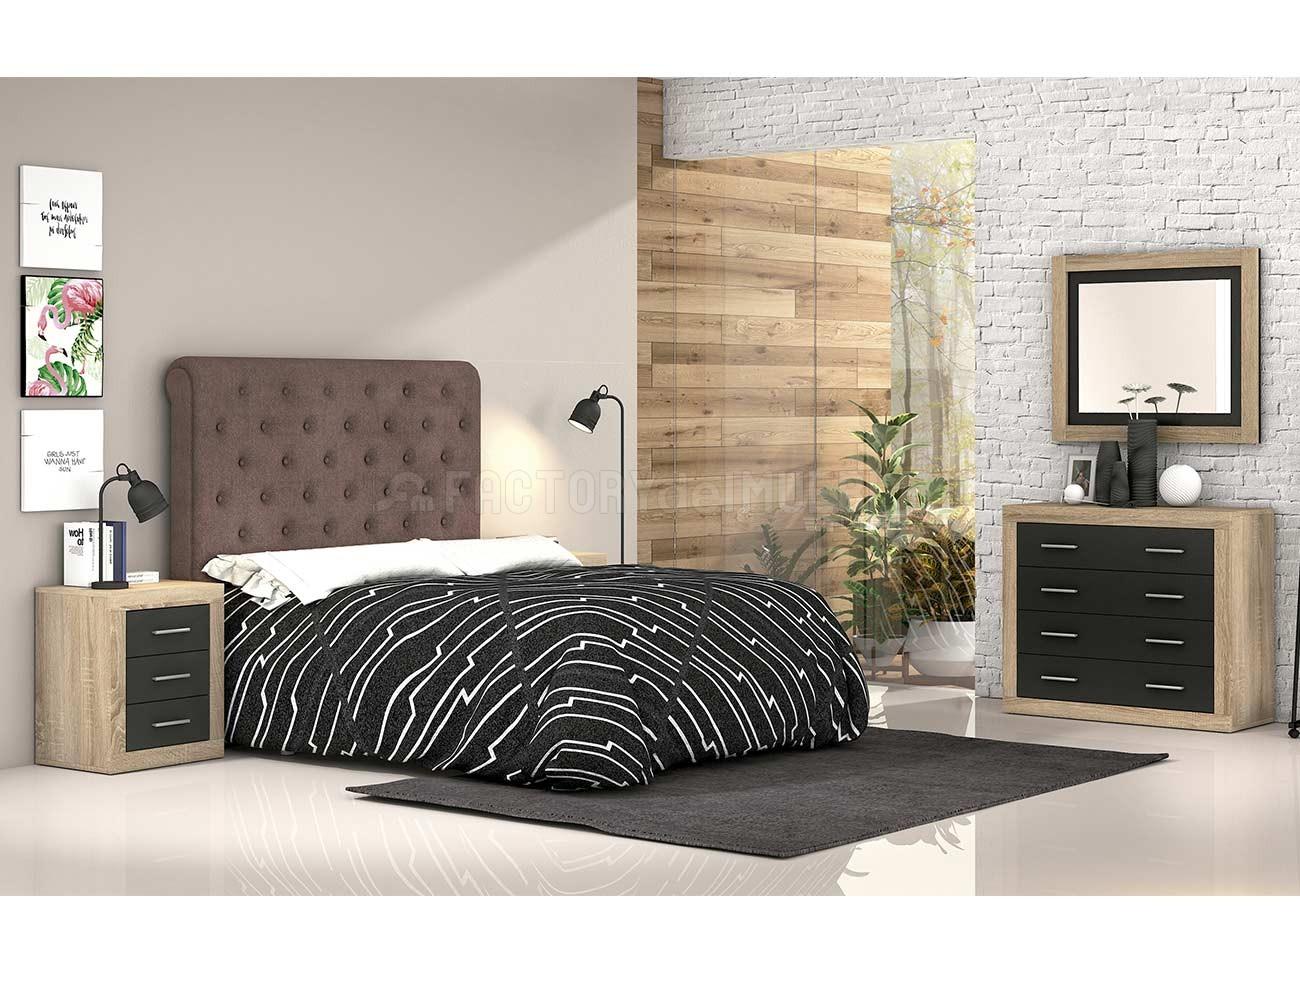 Dormitorio matrimonio moderno 522